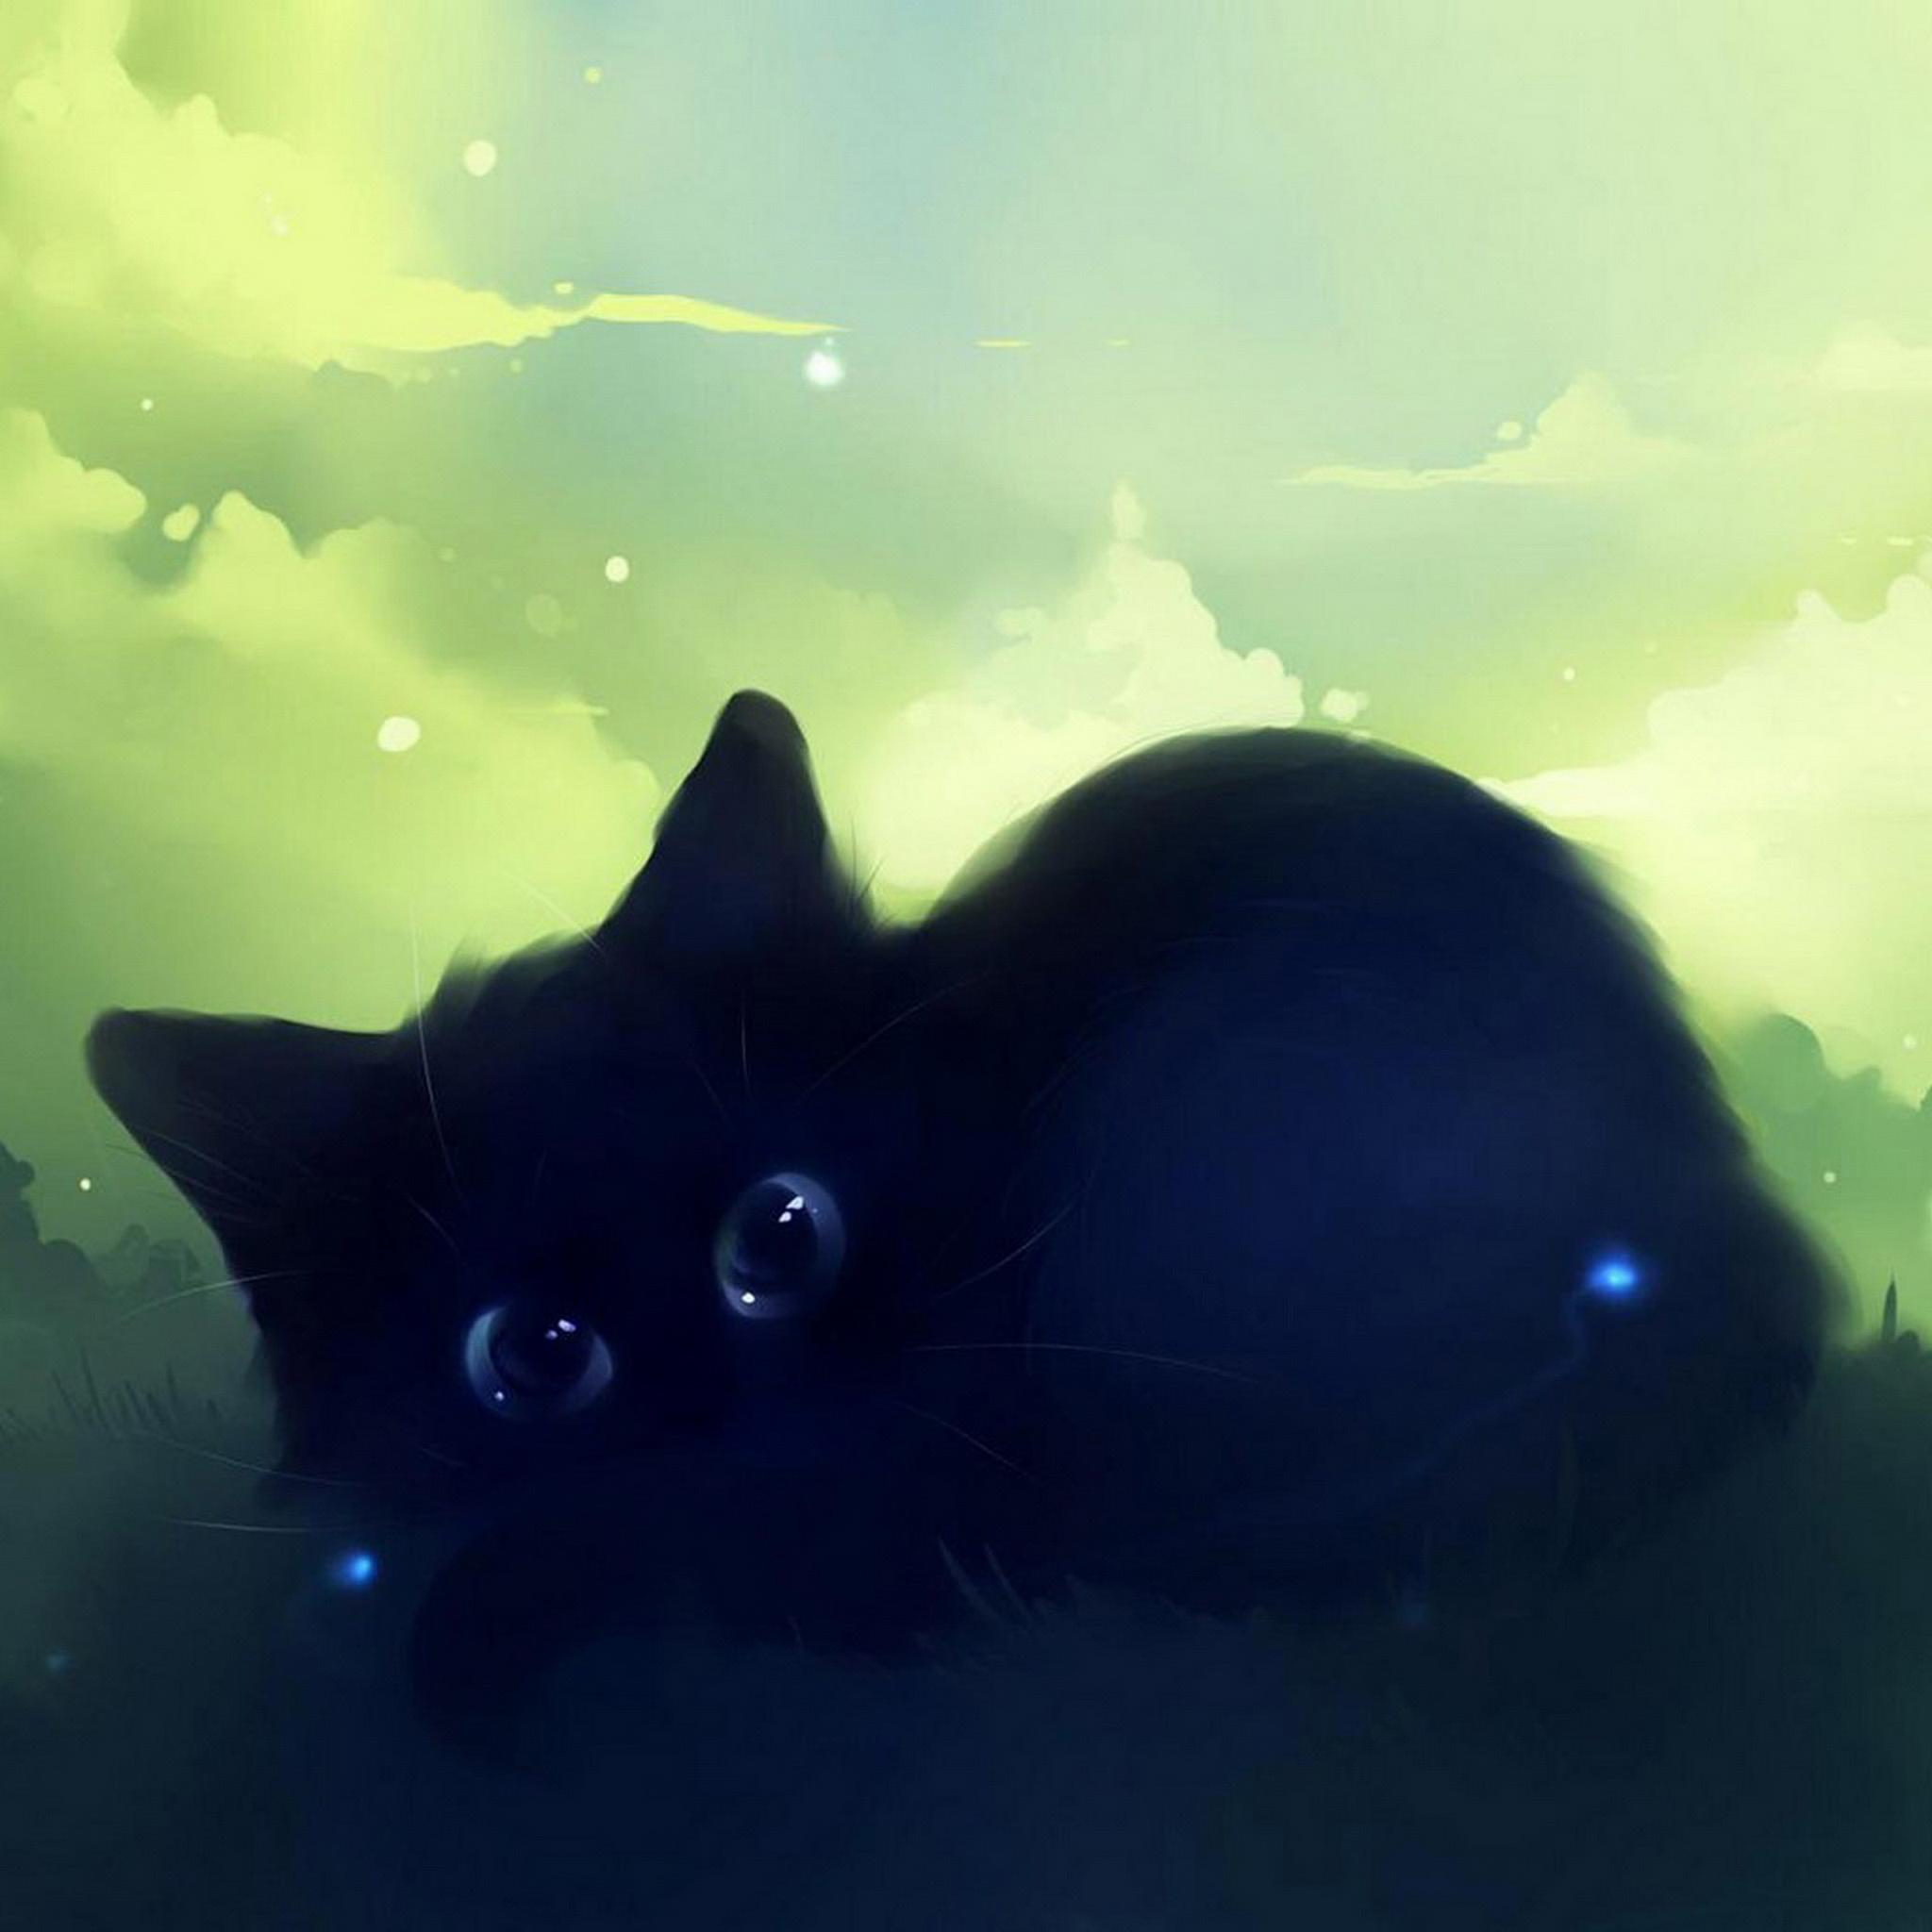 Eyes Black Cat 3Wallpapers iPad Retina Eyes Black Cat   iPad Retina